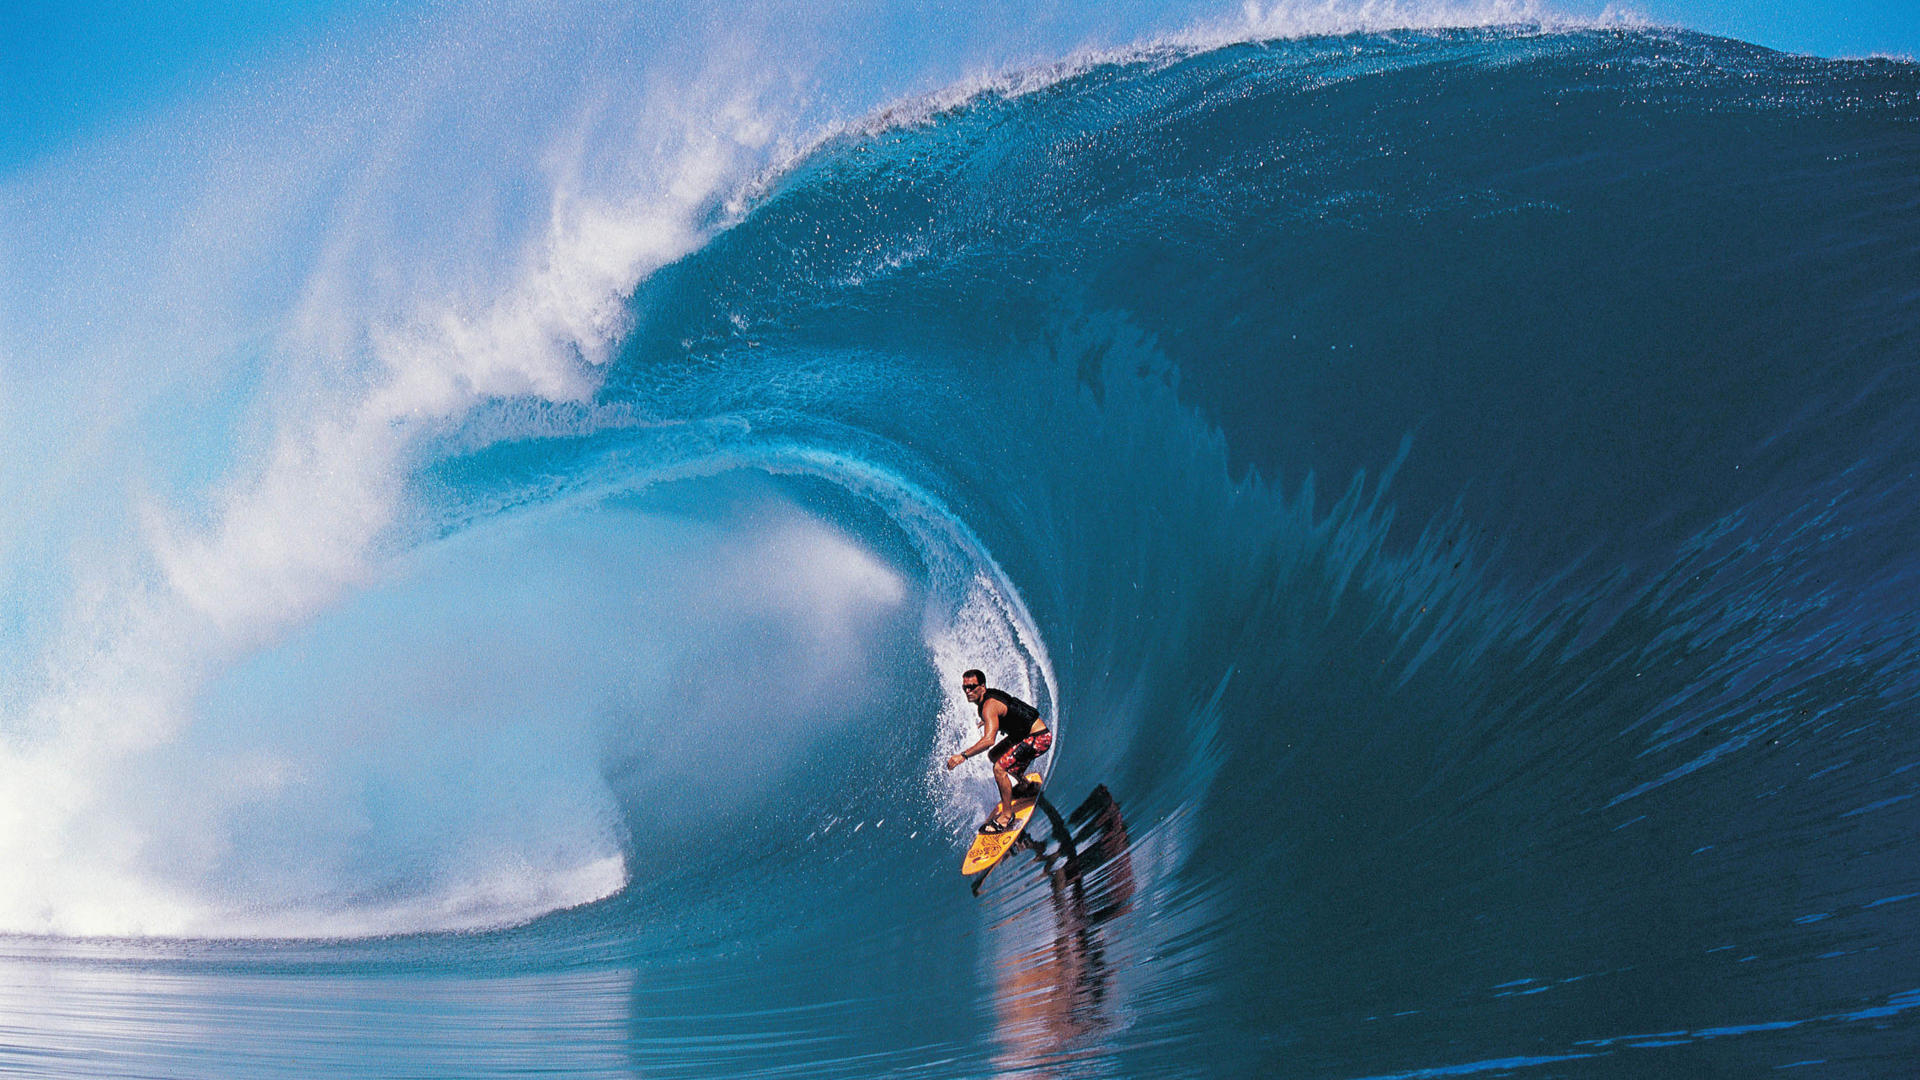 tahiti wave surf wallpaper HD Desktop Wallpapers 1920x1080